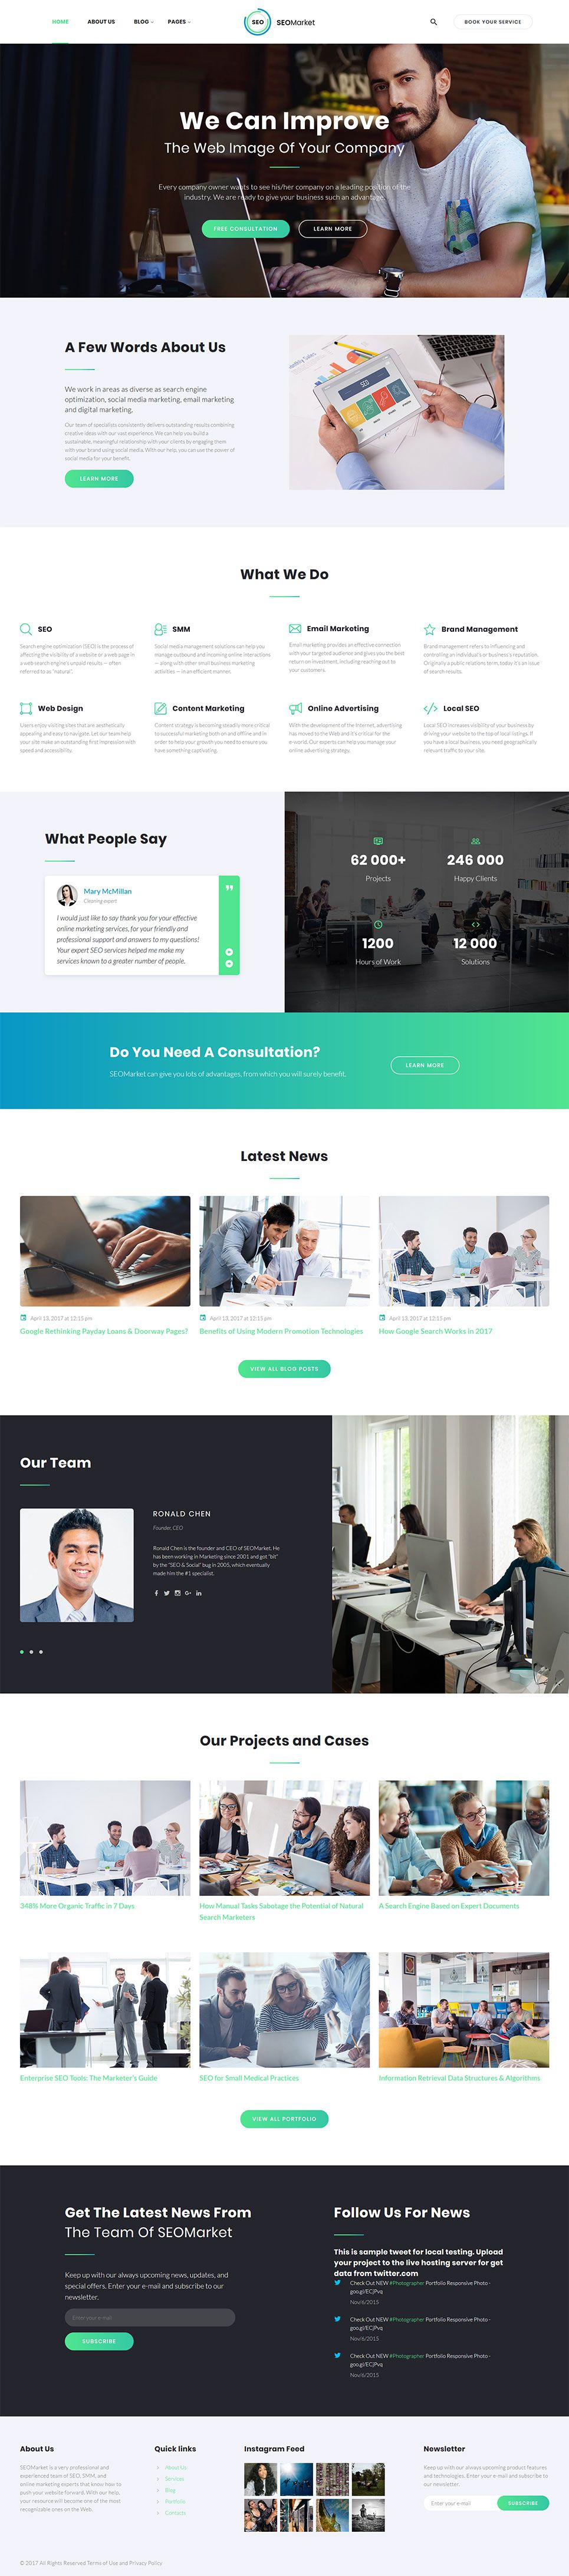 SEOMarket - SEO & Marketing Agency Website Template | Template ...